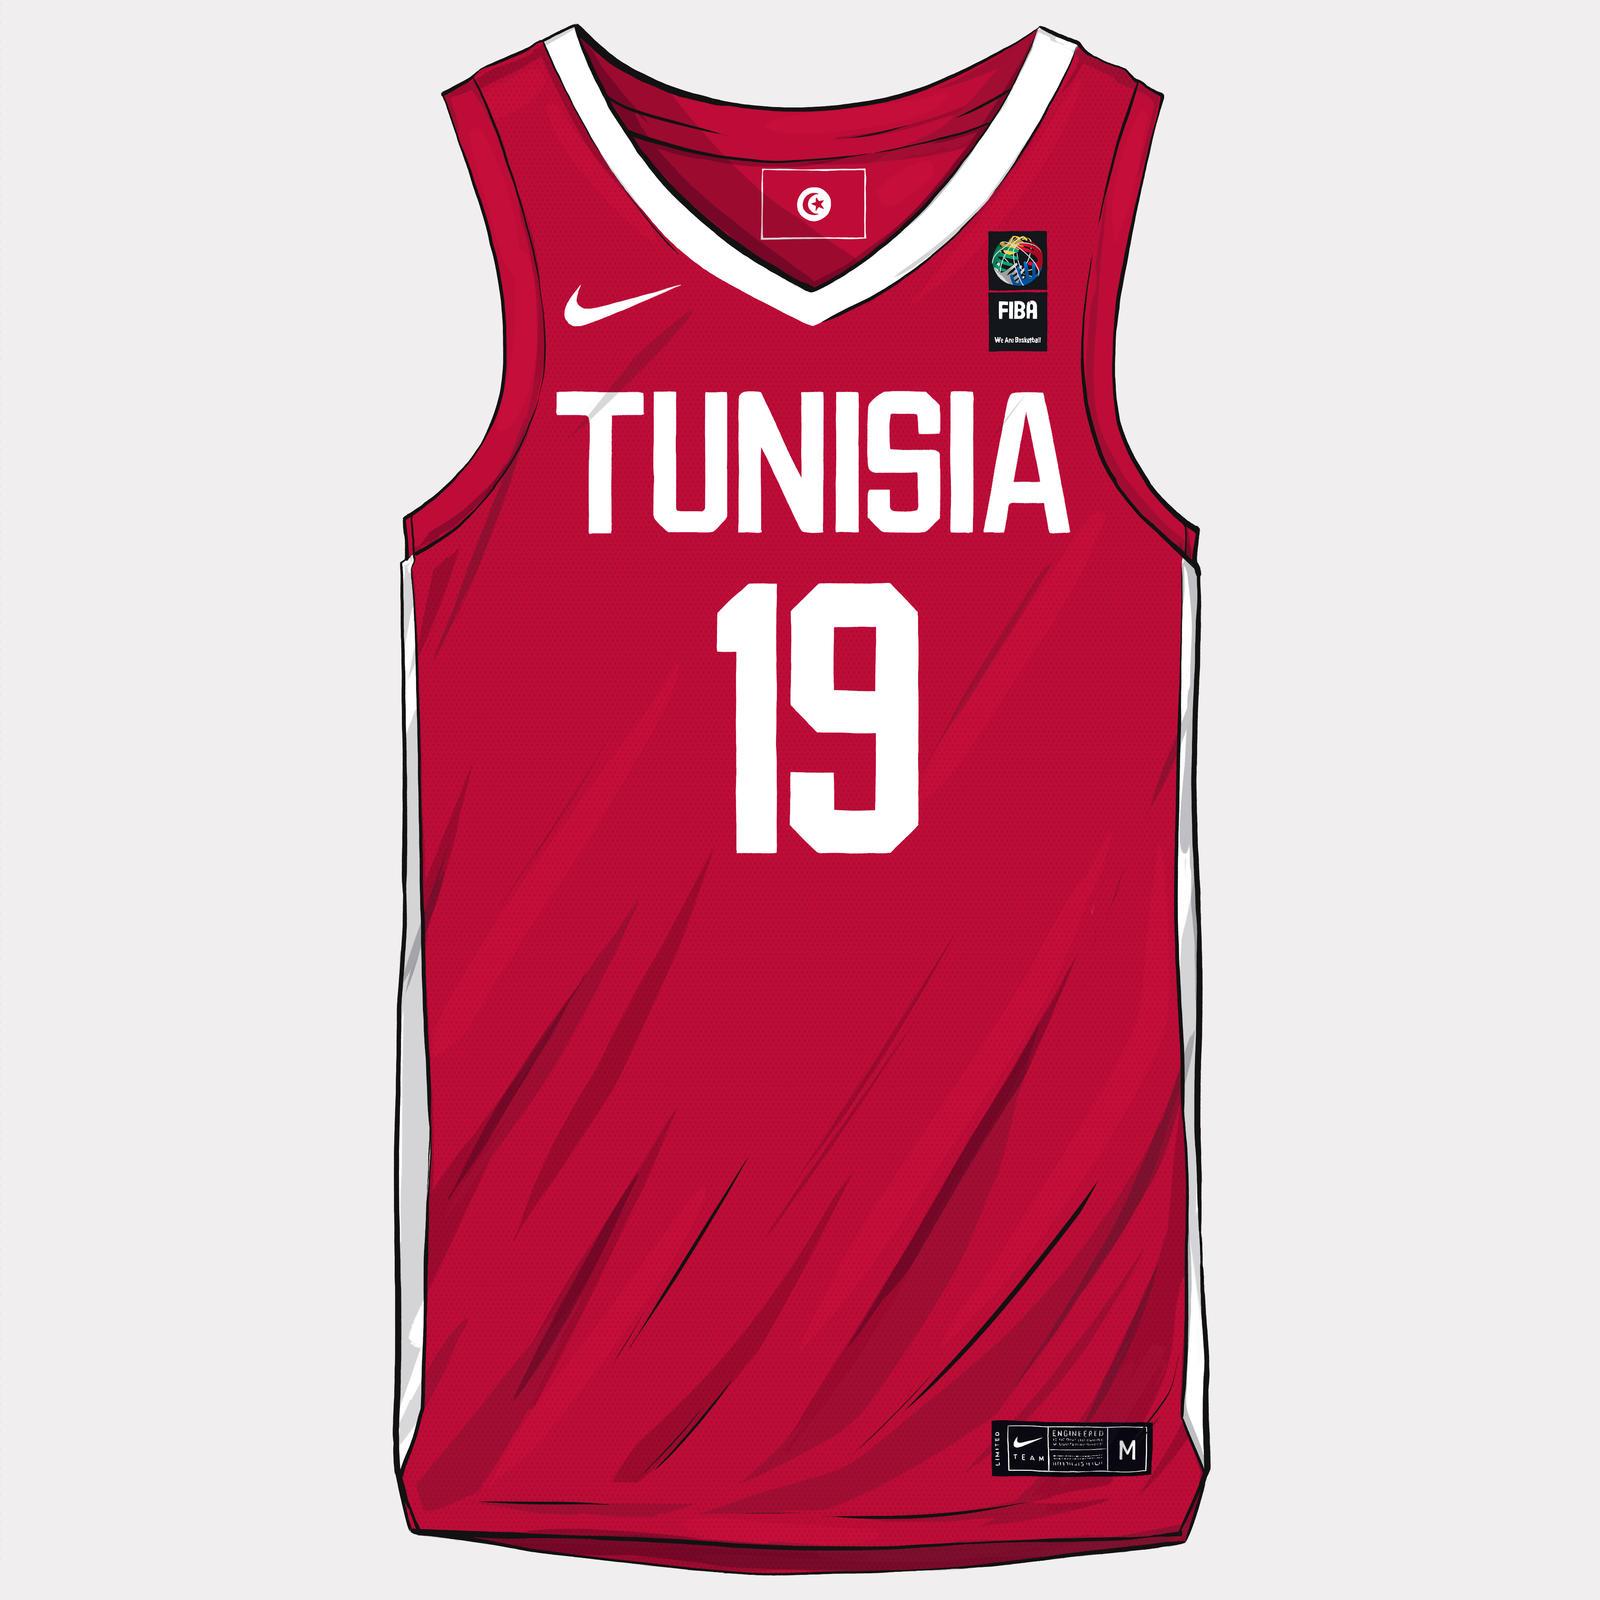 nike-news-tunisia-national-team-kit-2019-illustration-1x1_1_square_1600.jpg